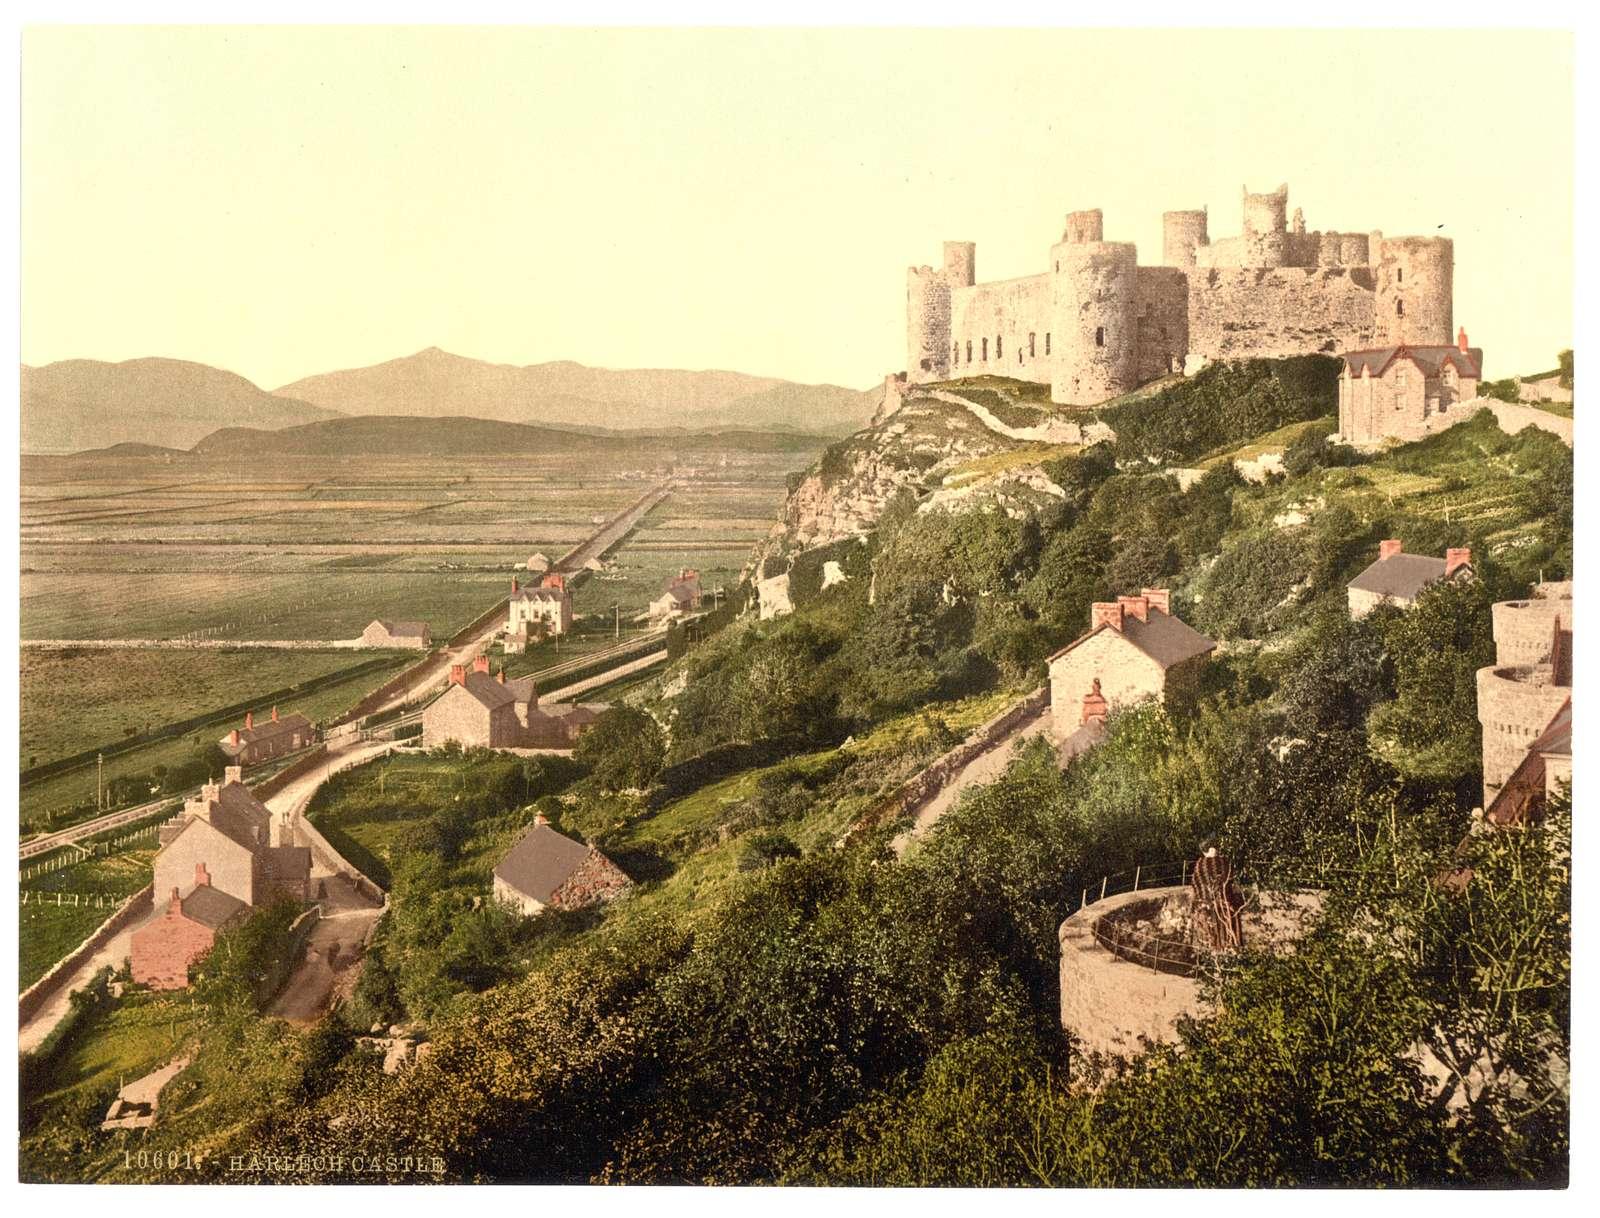 [The castle, Harlech Castle, Wales]